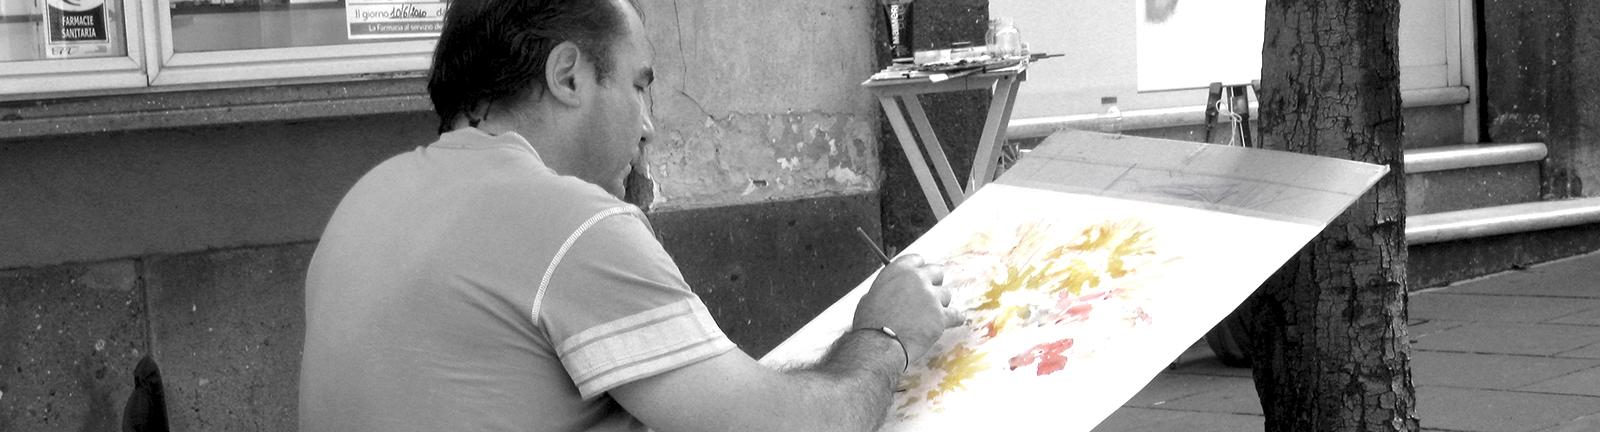 giampiero pierini acquerelli biografia